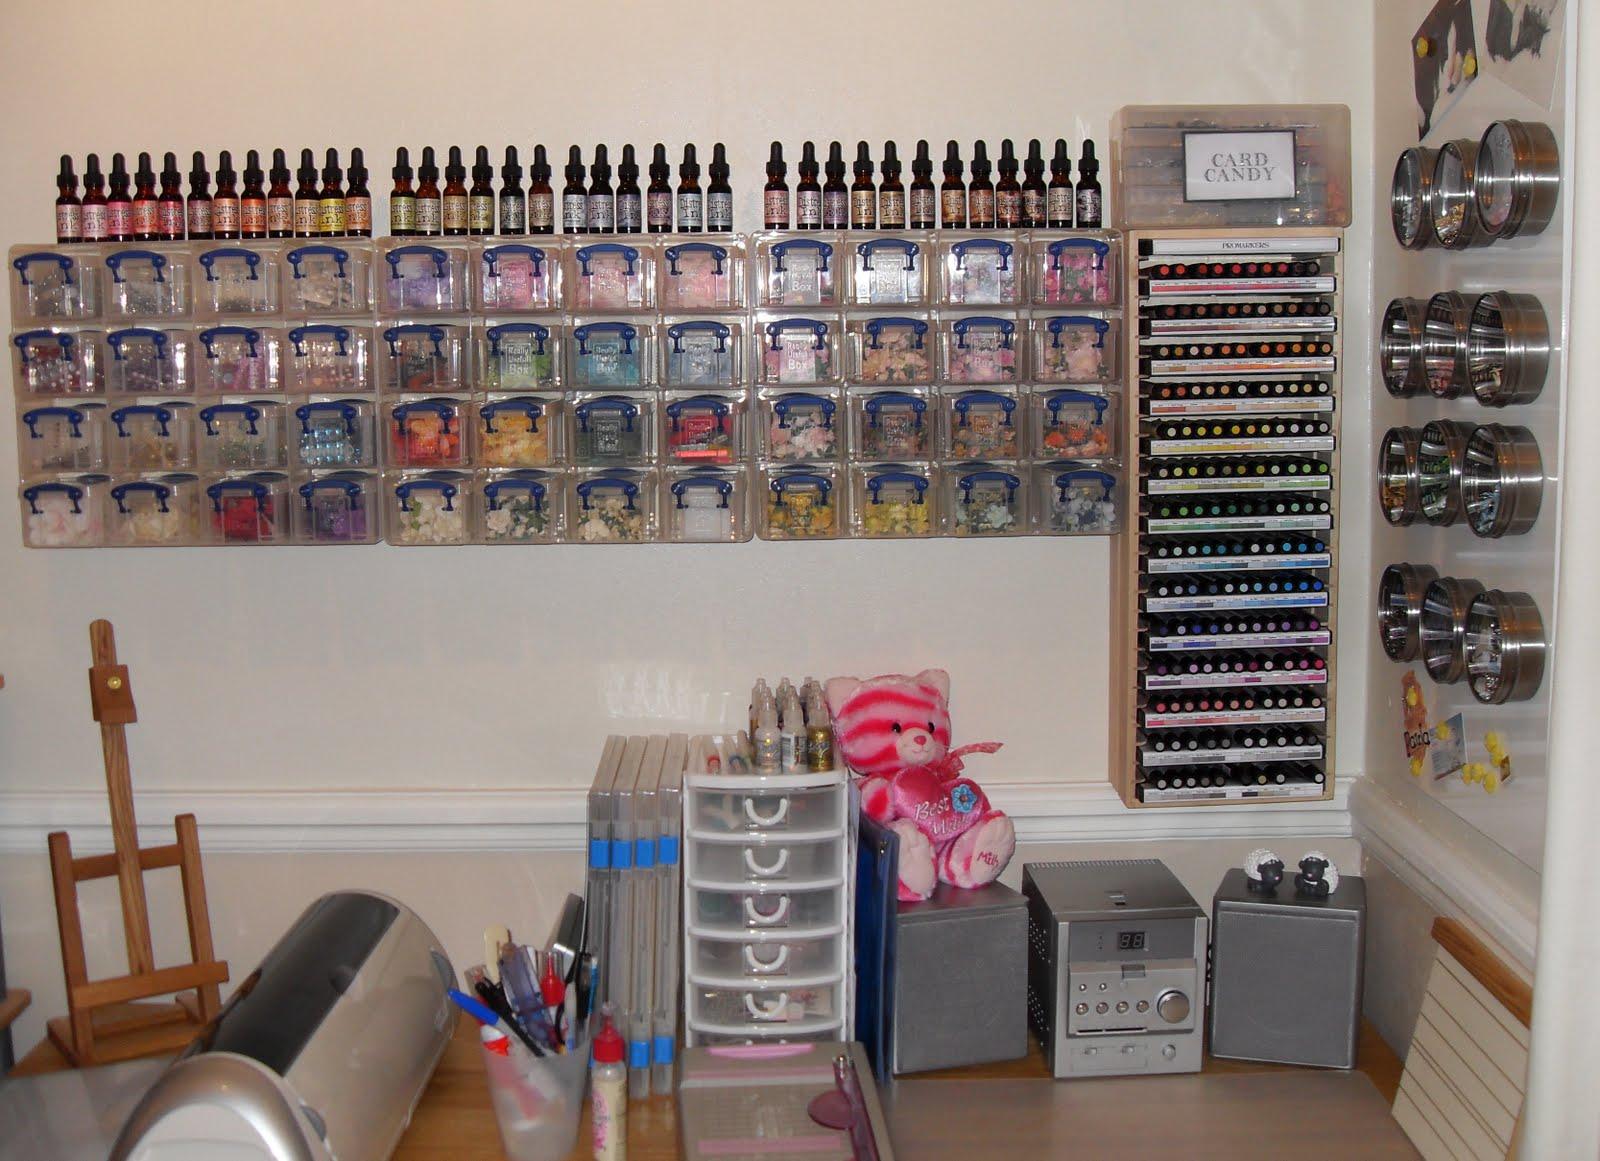 paulaholifieldcrafts: My craft room - UPDATED!!!